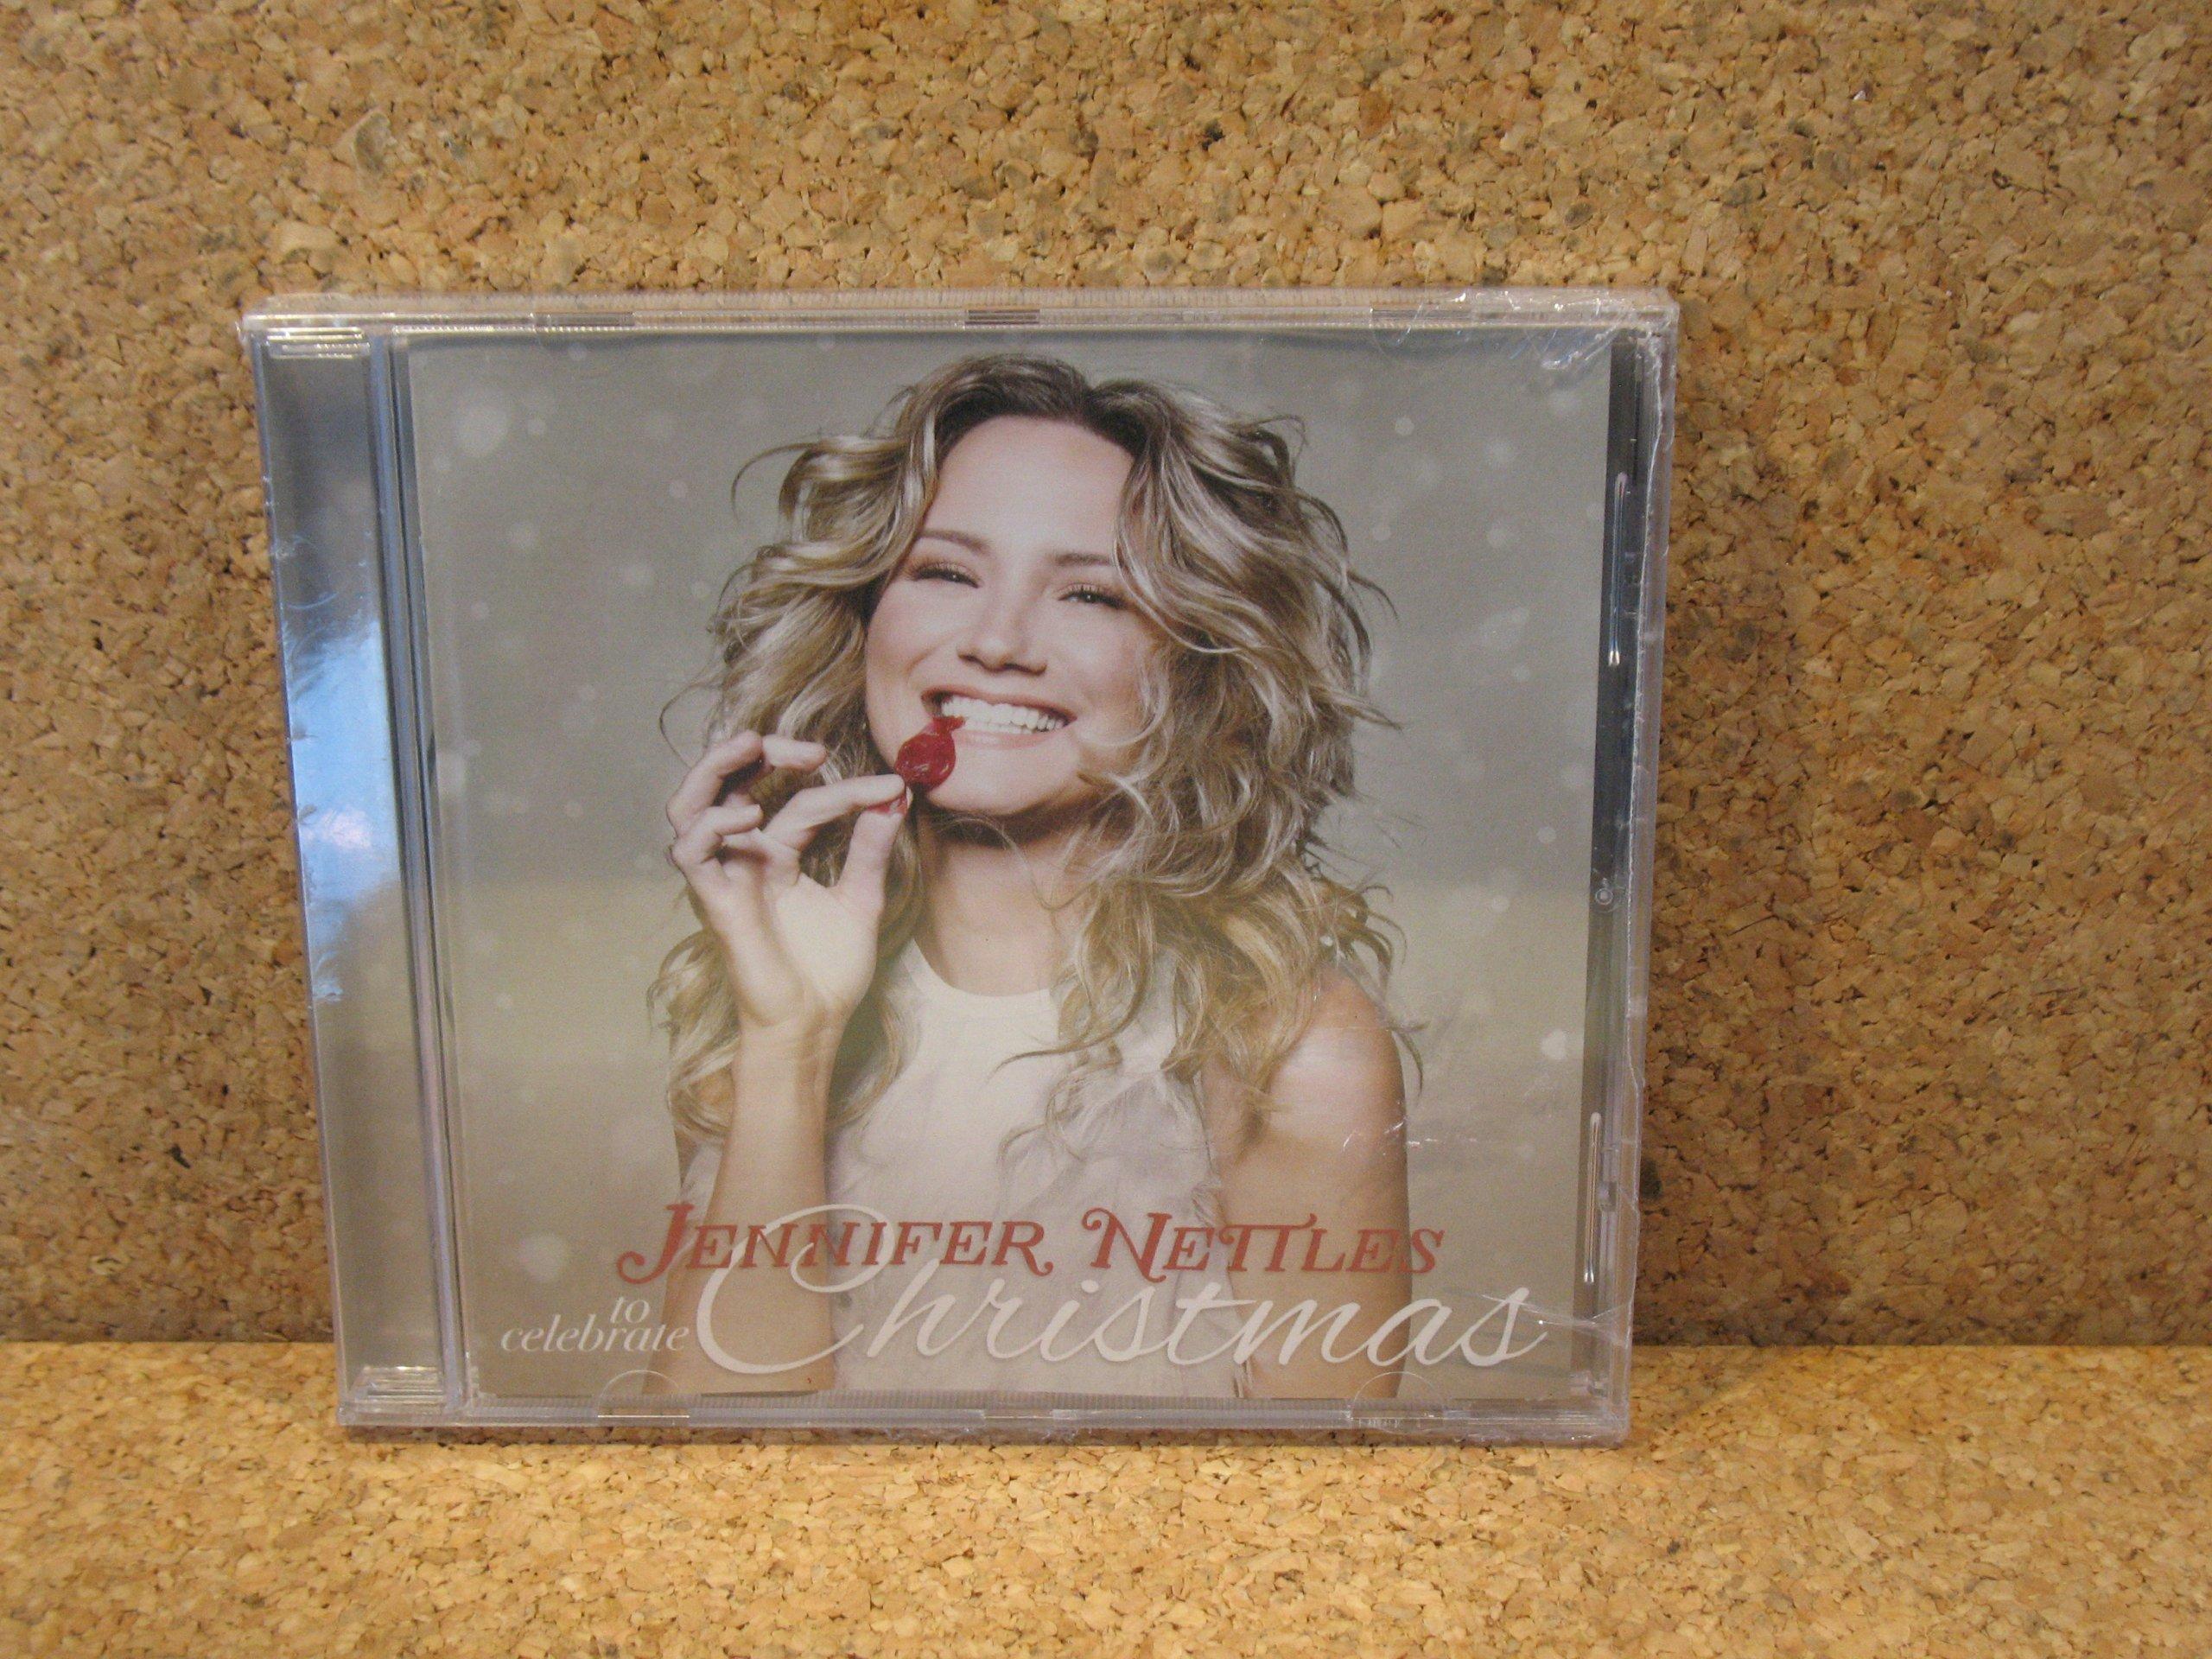 Jennifer Nettles - To Celebrate Christmas - 7384791052 - oficjalne ...